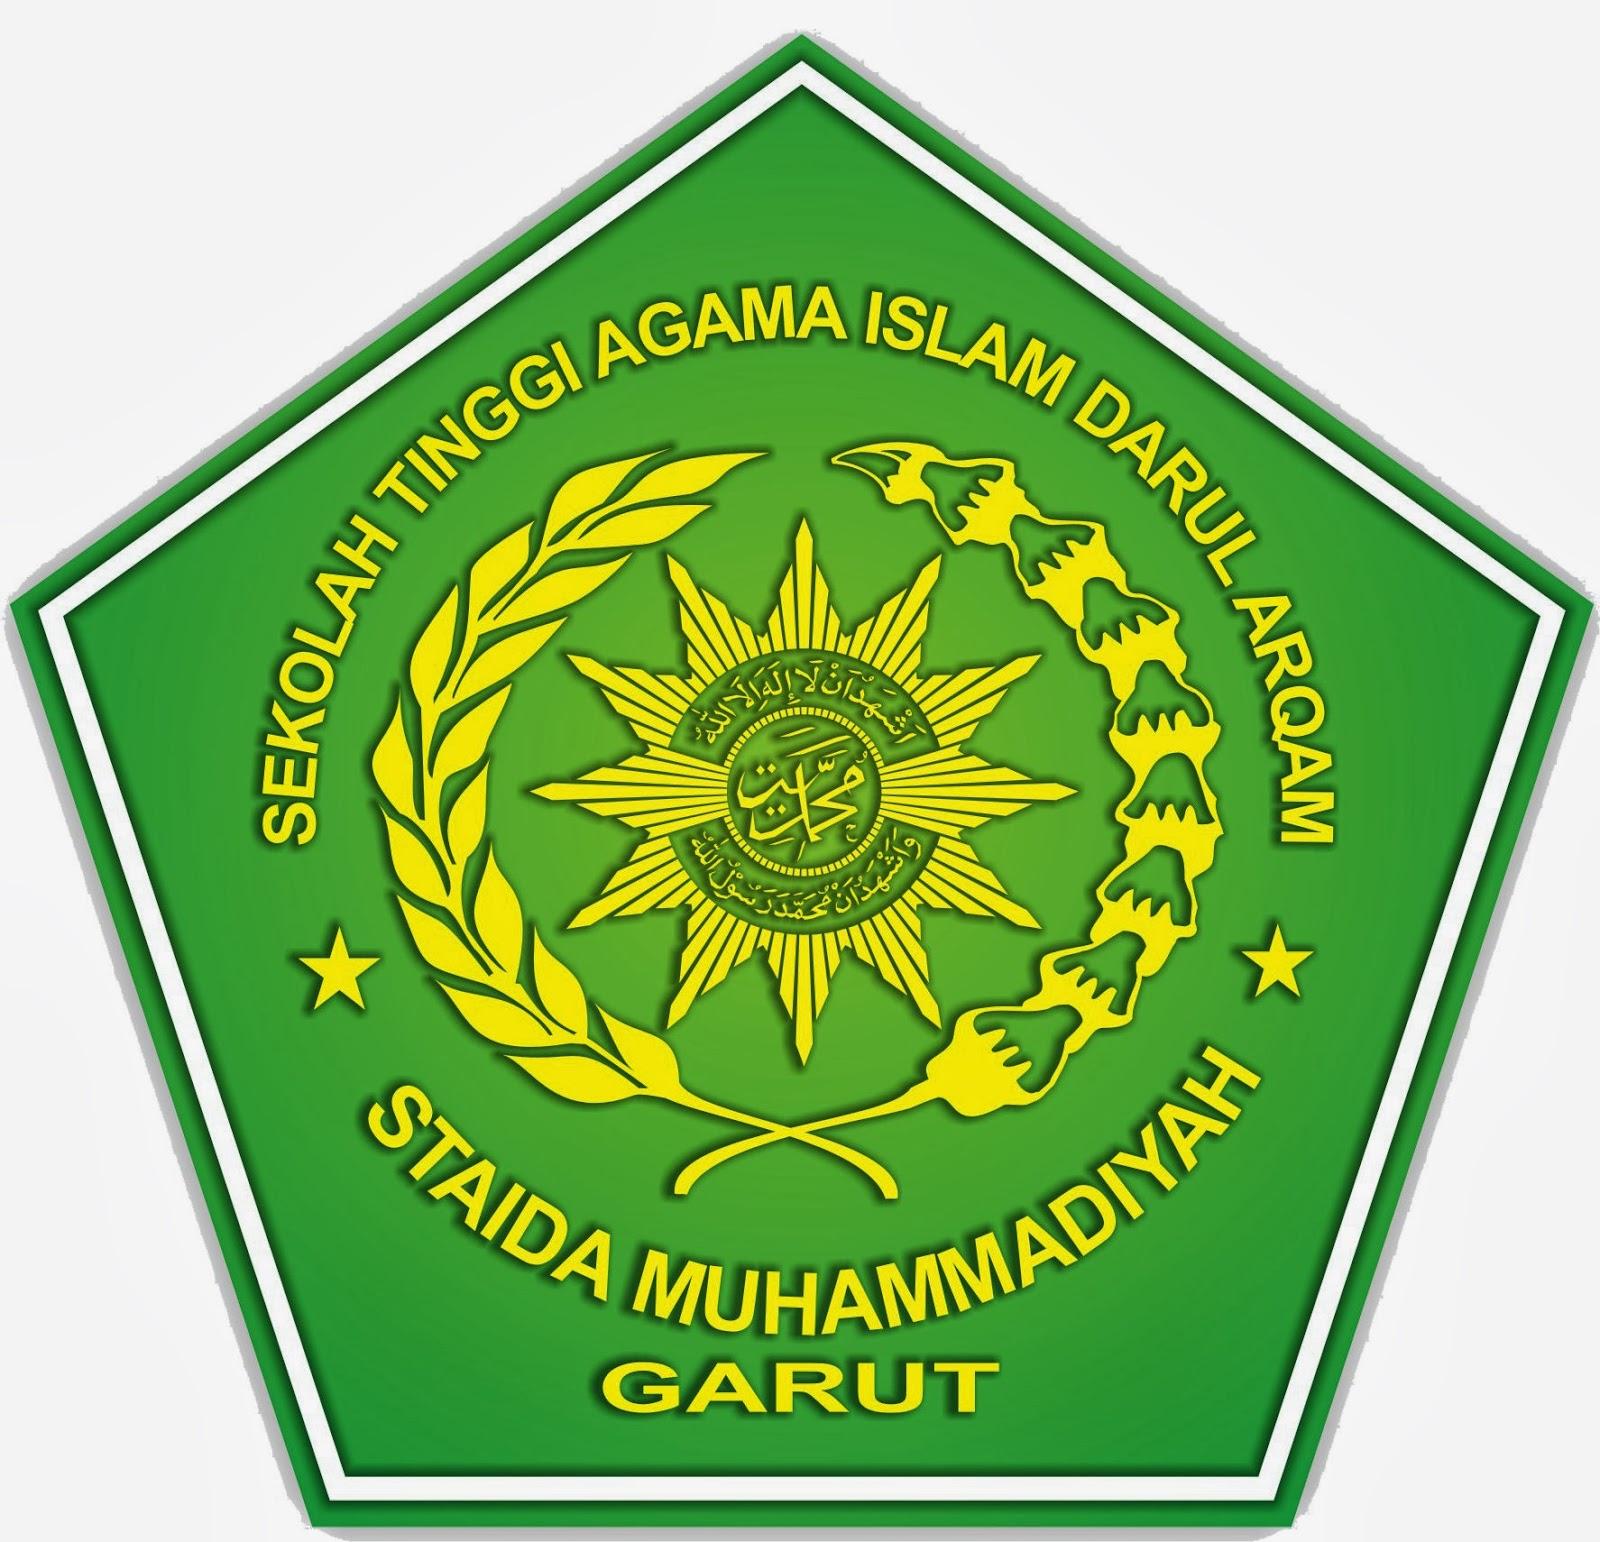 islam is my life's: Logo STAIDA Muhammadiyah Garut